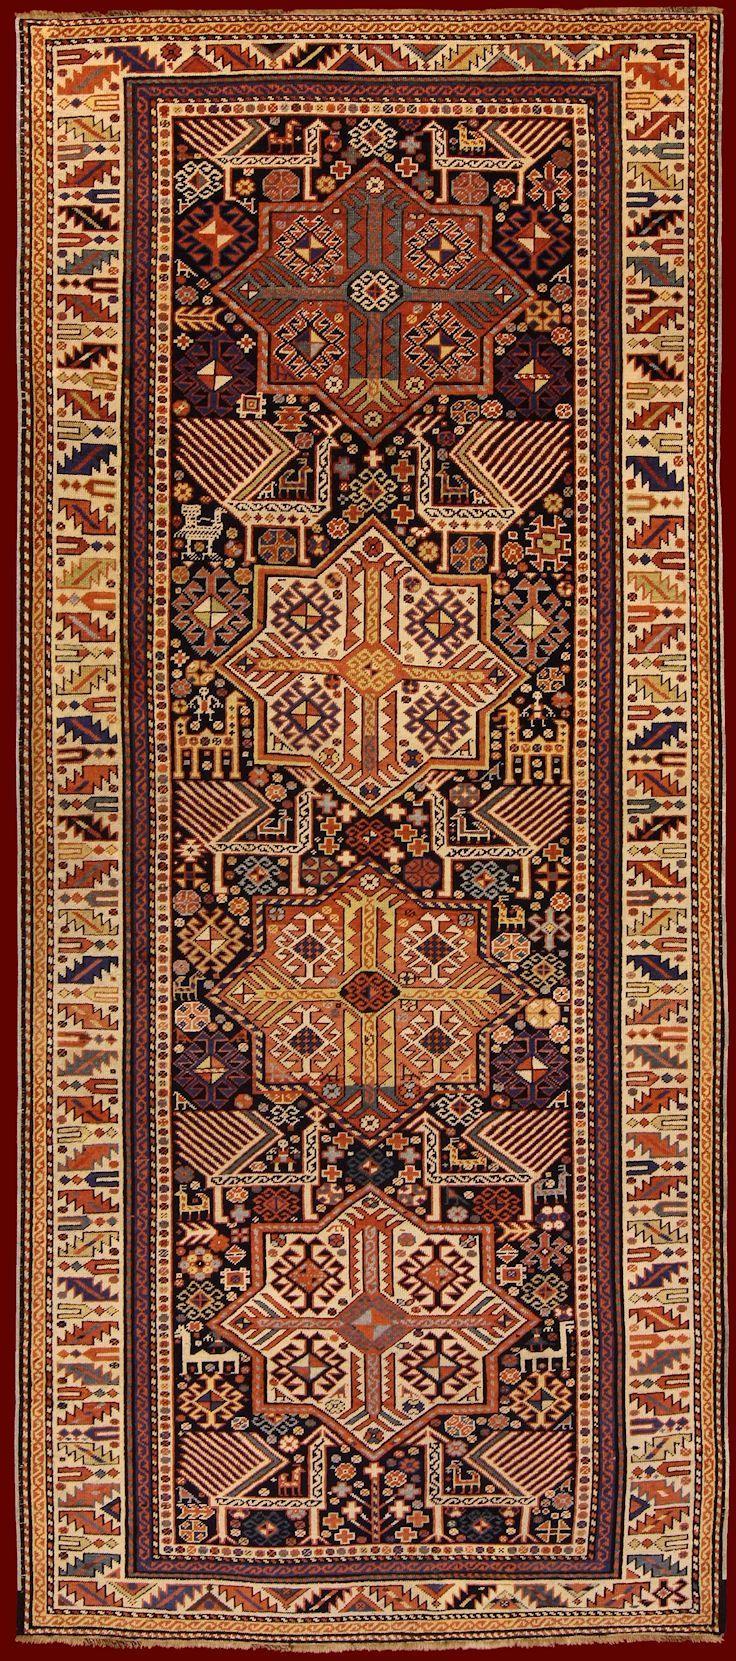 (494) SHIRVAN AKSTAFA ANTIQUE RUG cod. 141205259366 285 x 122 | persian rugs | Pinterest